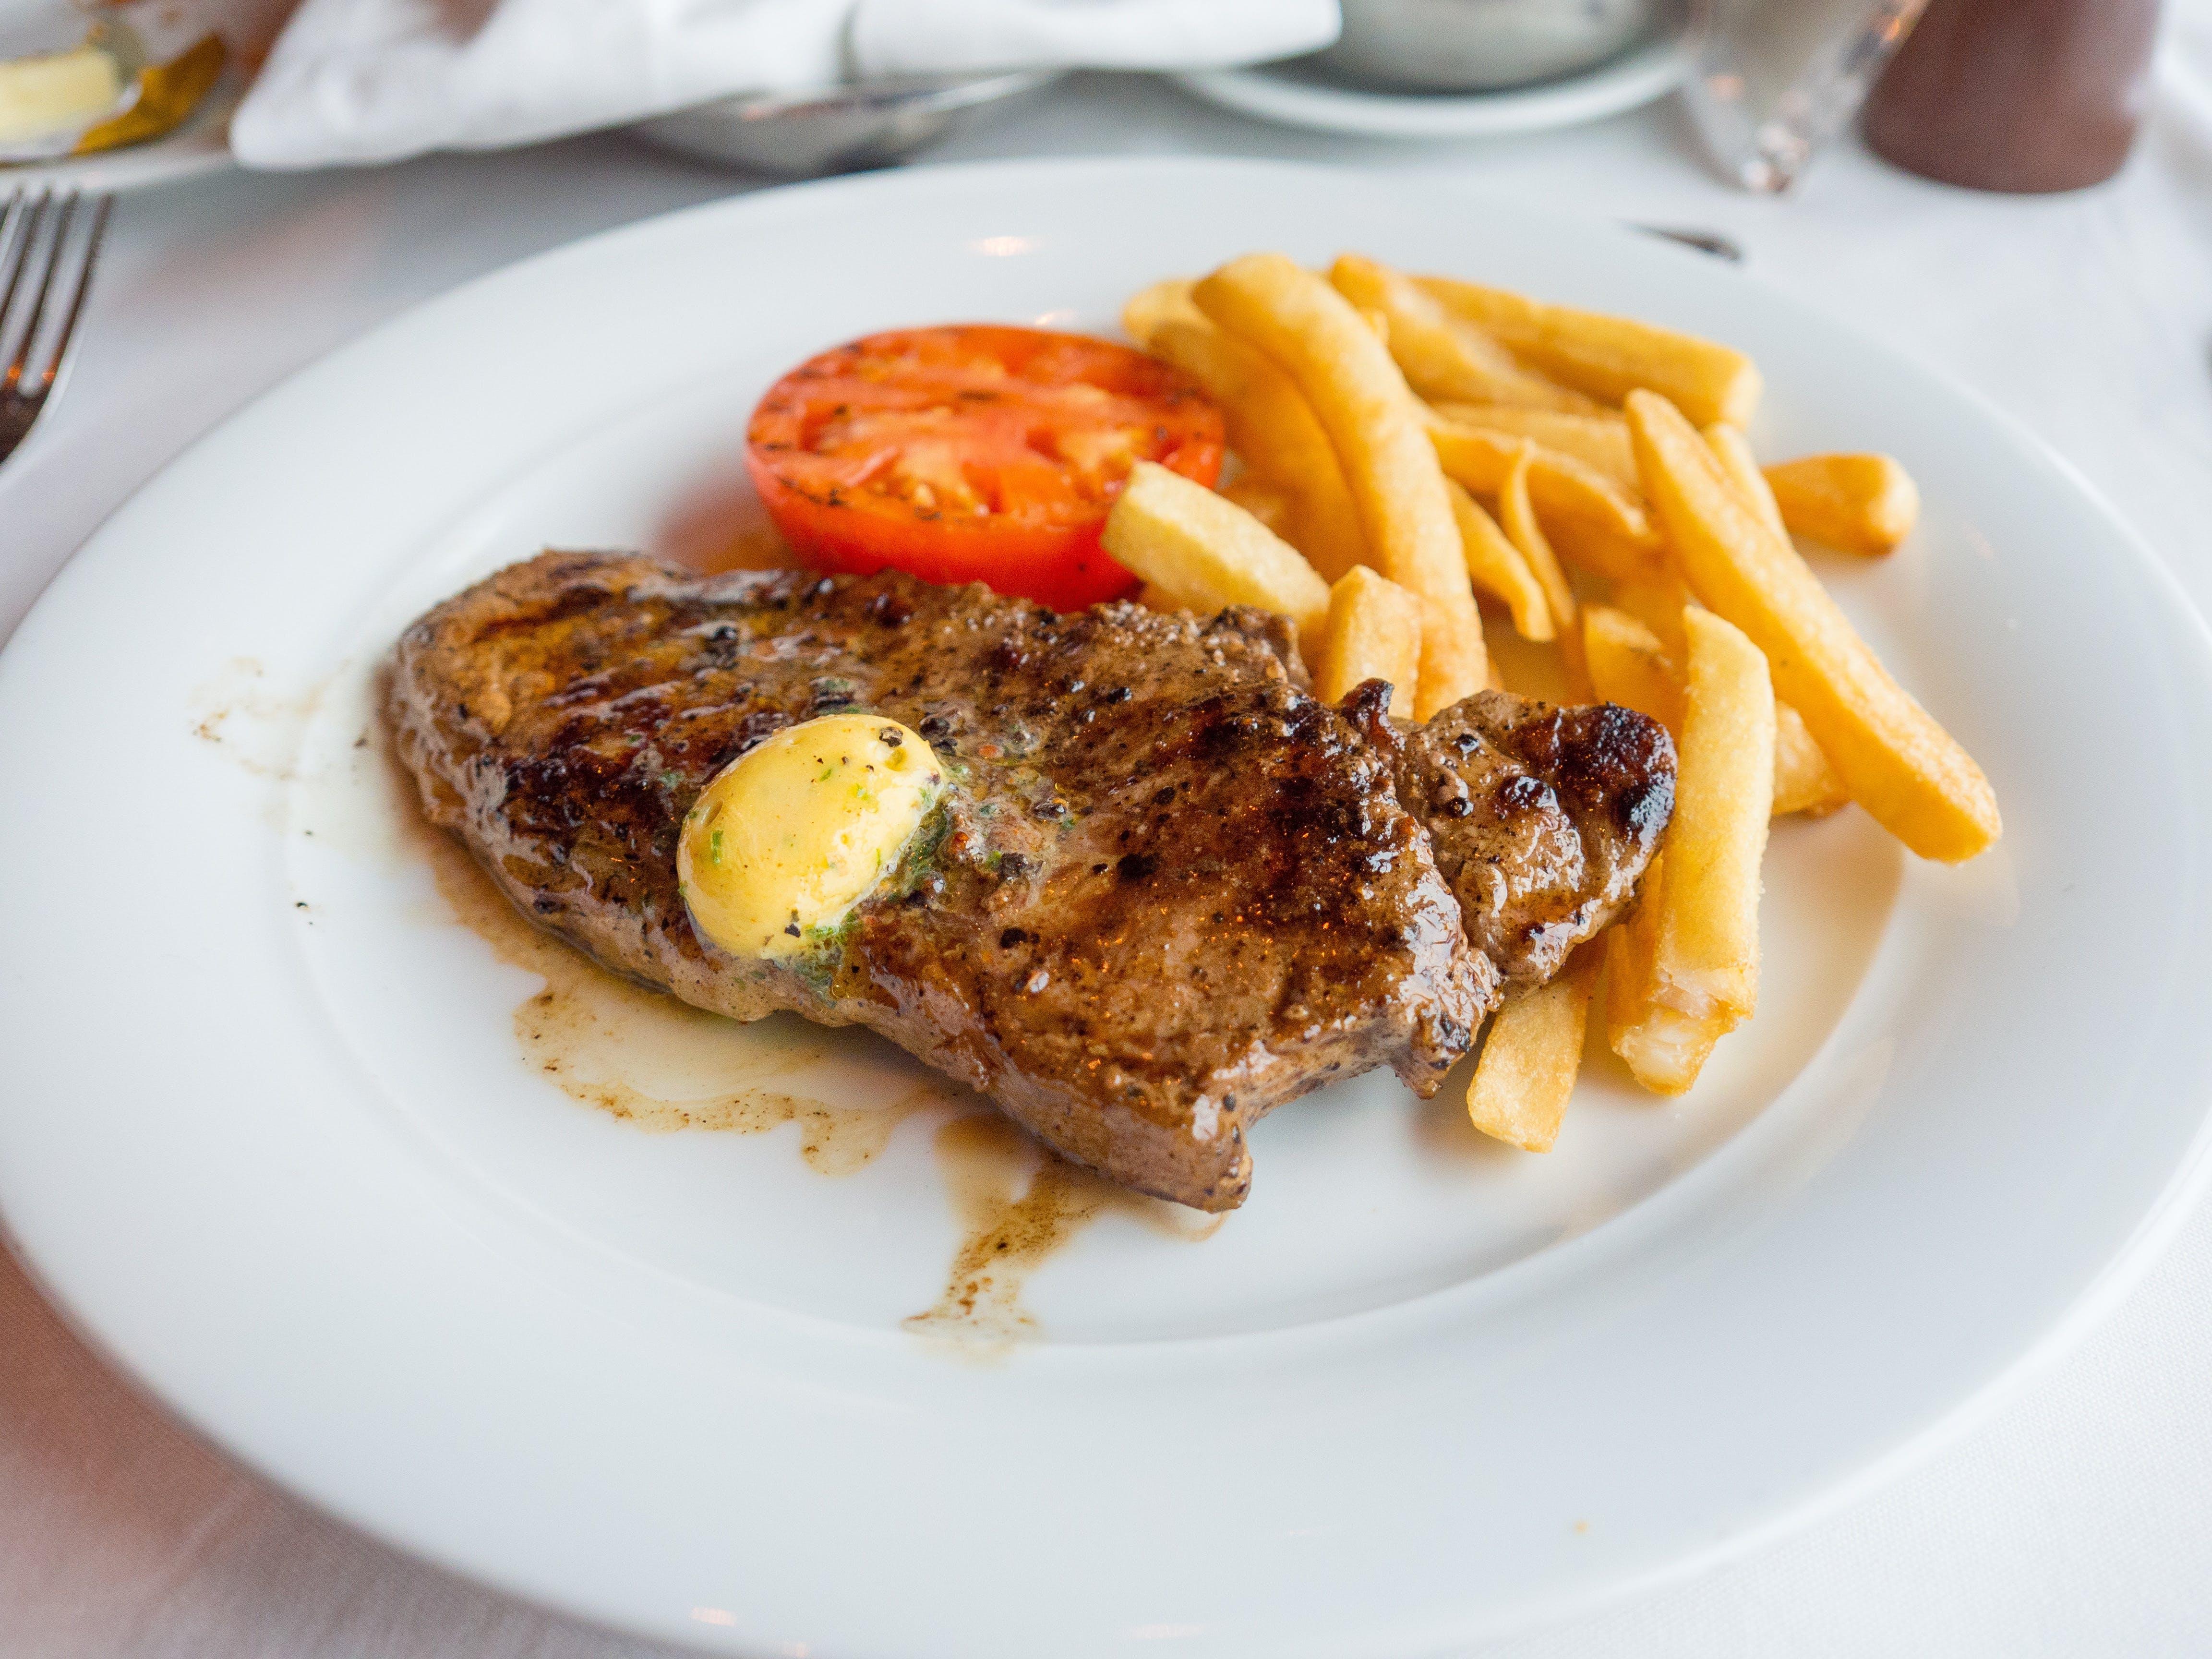 Free stock photo of food, plate, restaurant, dinner